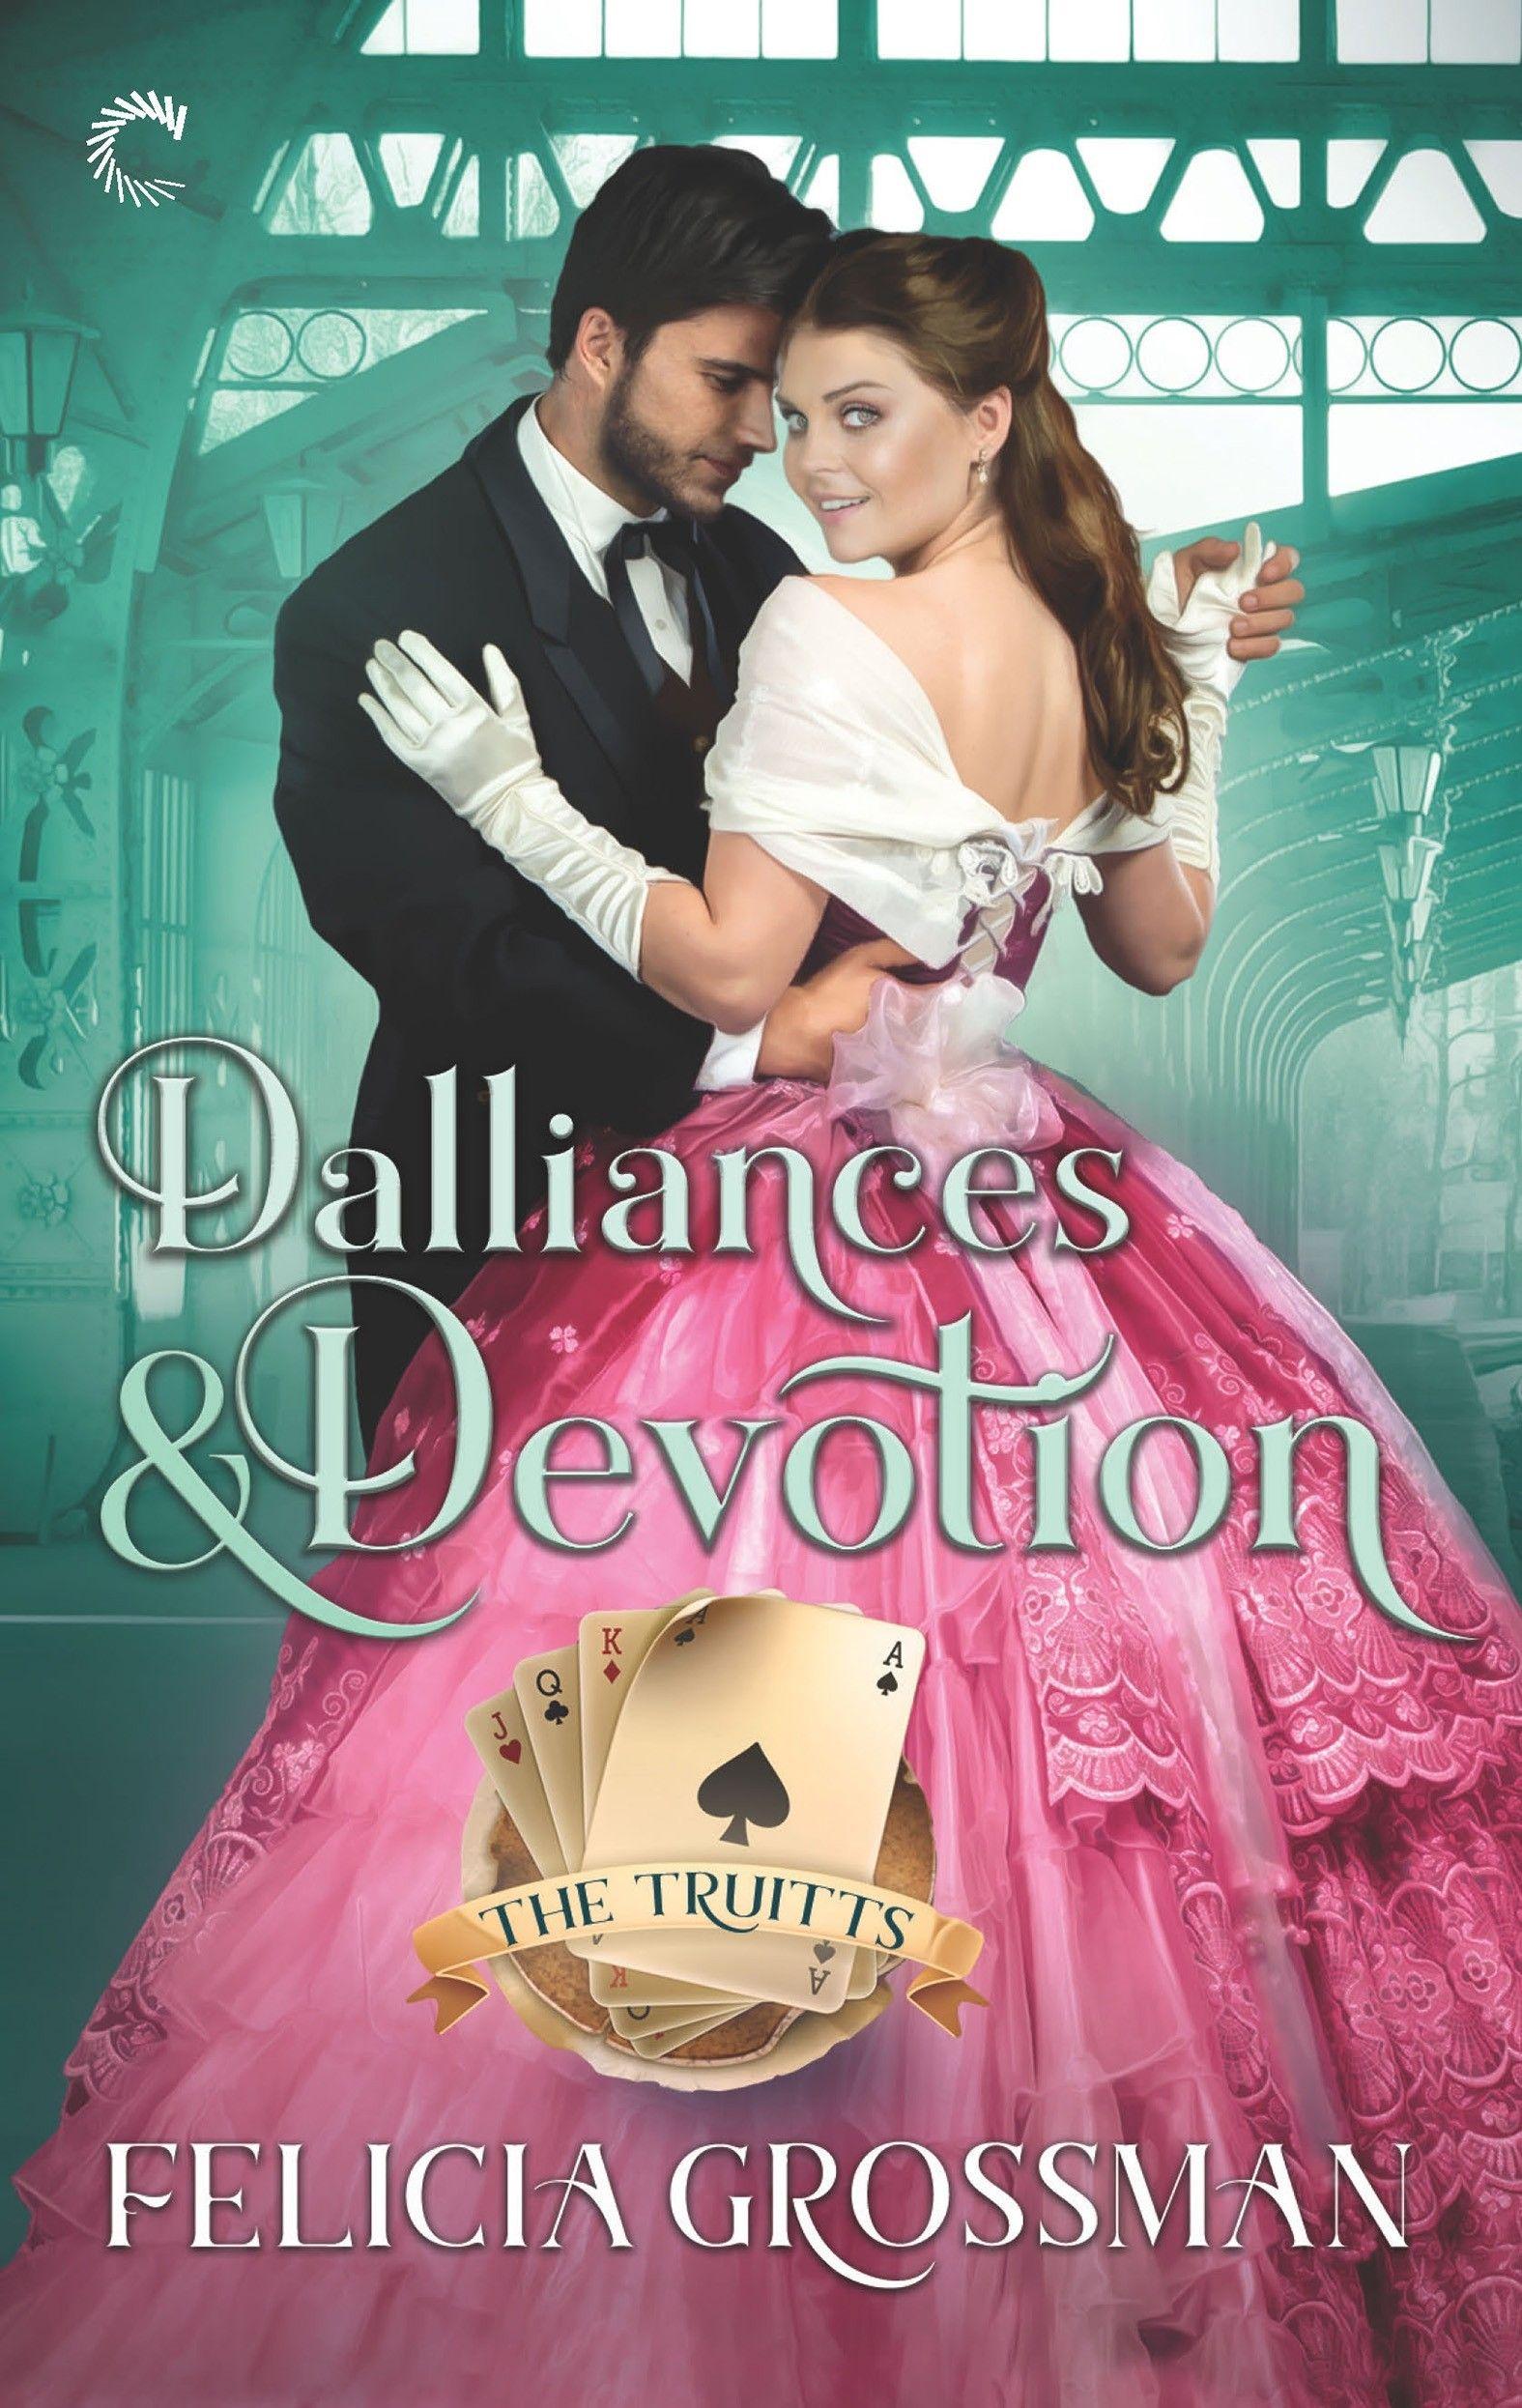 Dalliances & Devotion  by Felicia Grossman